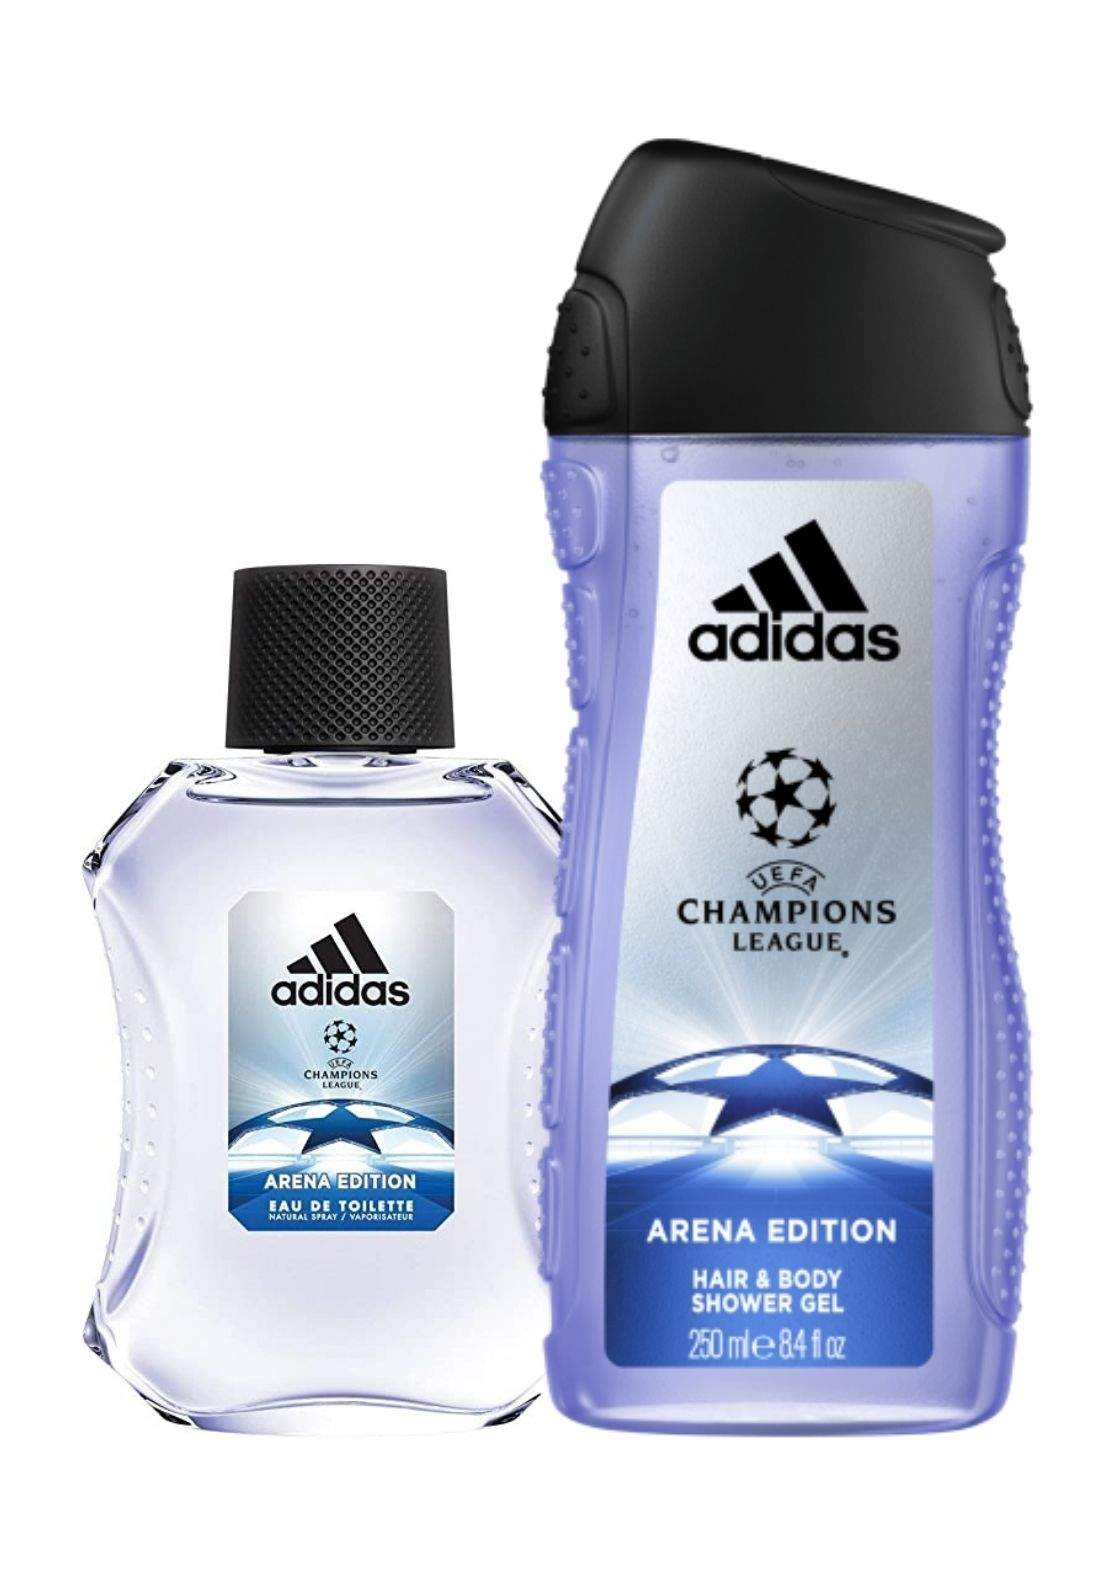 Adidas Champions Leaguee Arena Edition 2 in 1 سيت العناية للرجل